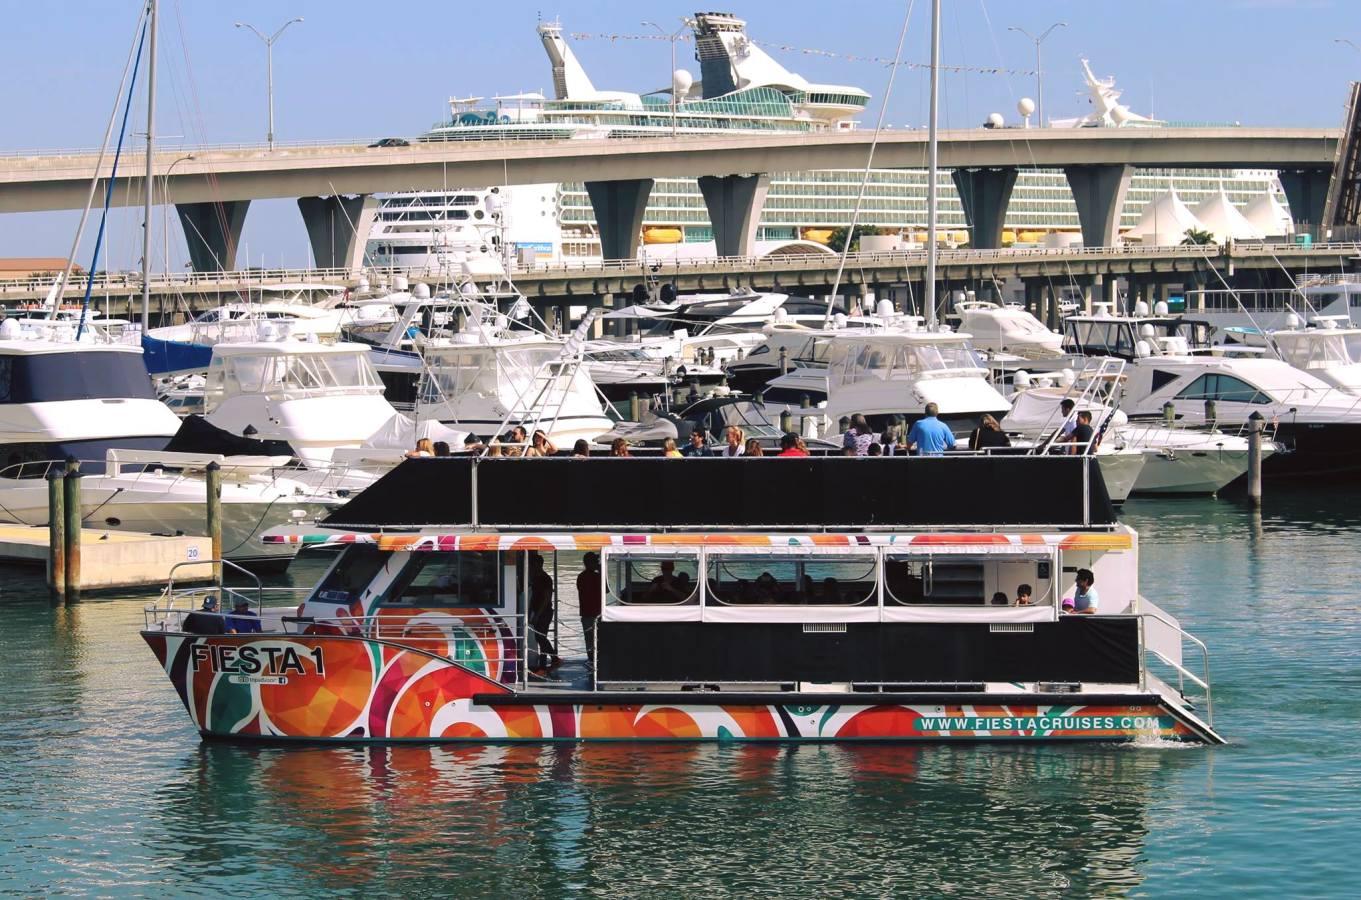 Fiesta Cruises du capitaine Jimmy2